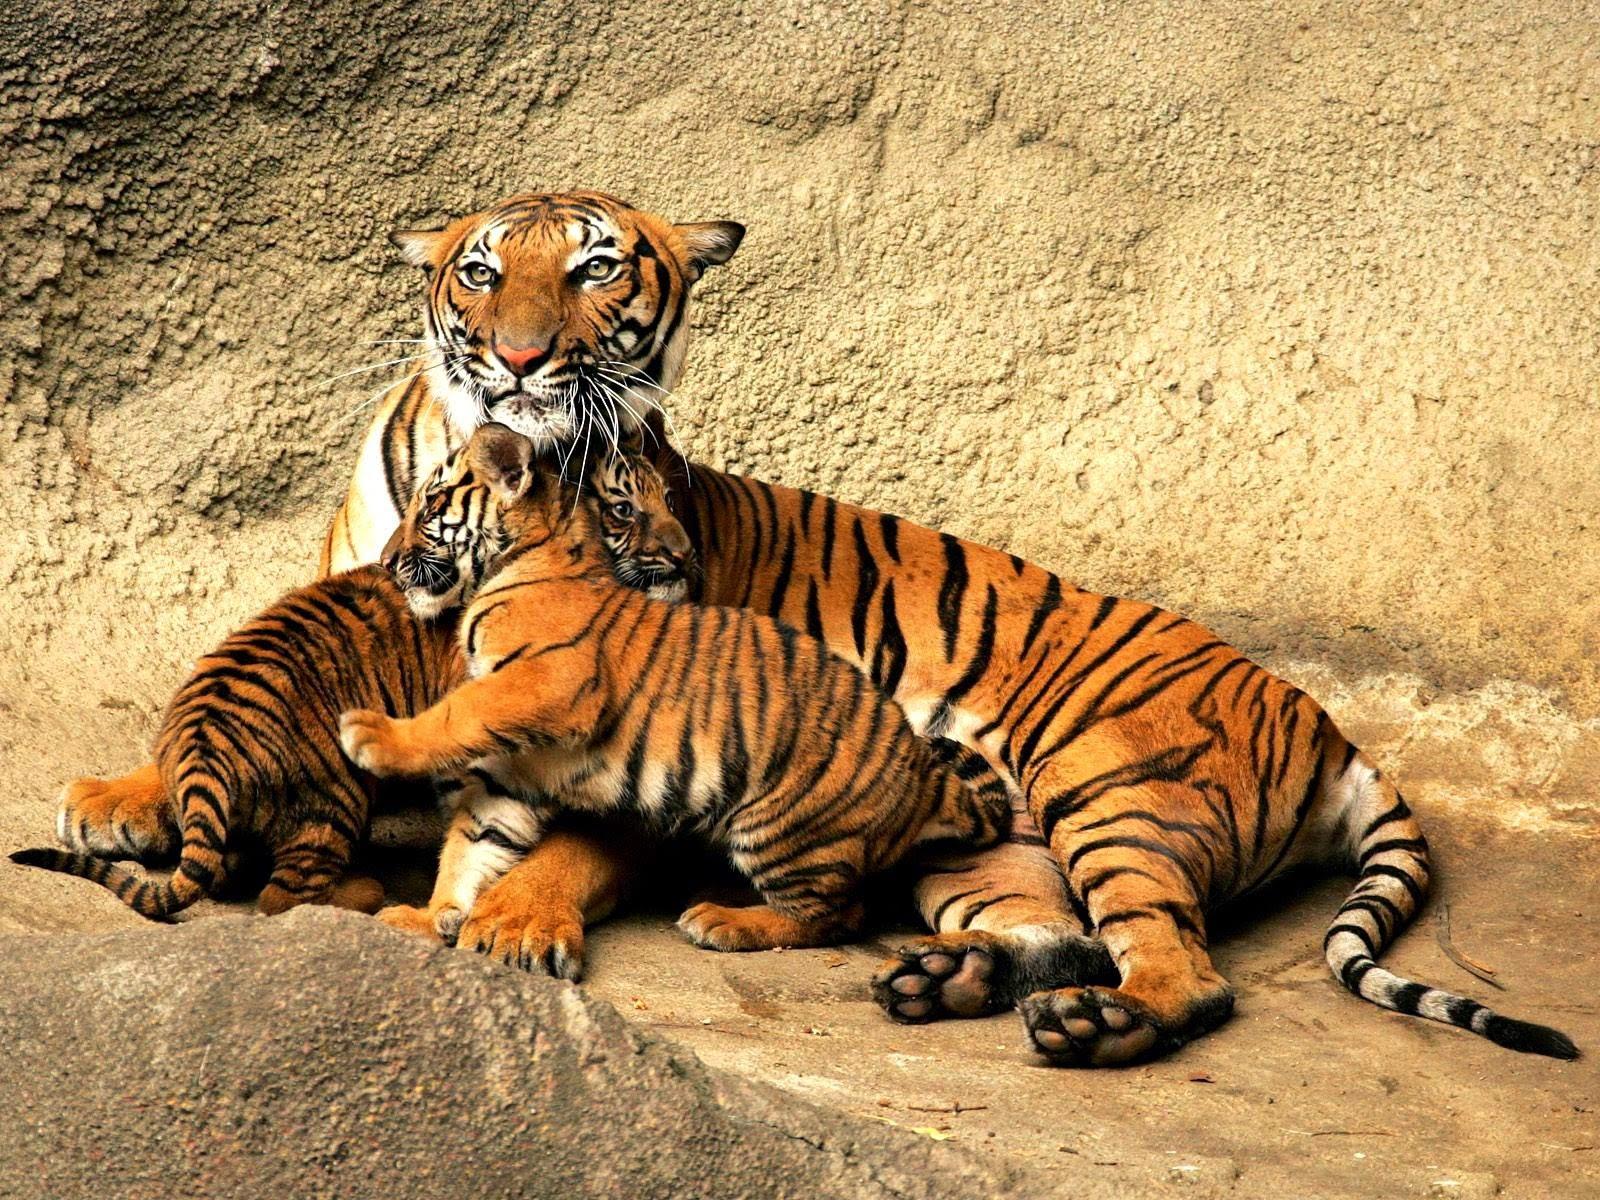 Wallpaper Bengal Tiger Hd Animals 10217: Desktop HD Wallpapers Free Downloads: Bengal Tiger HD